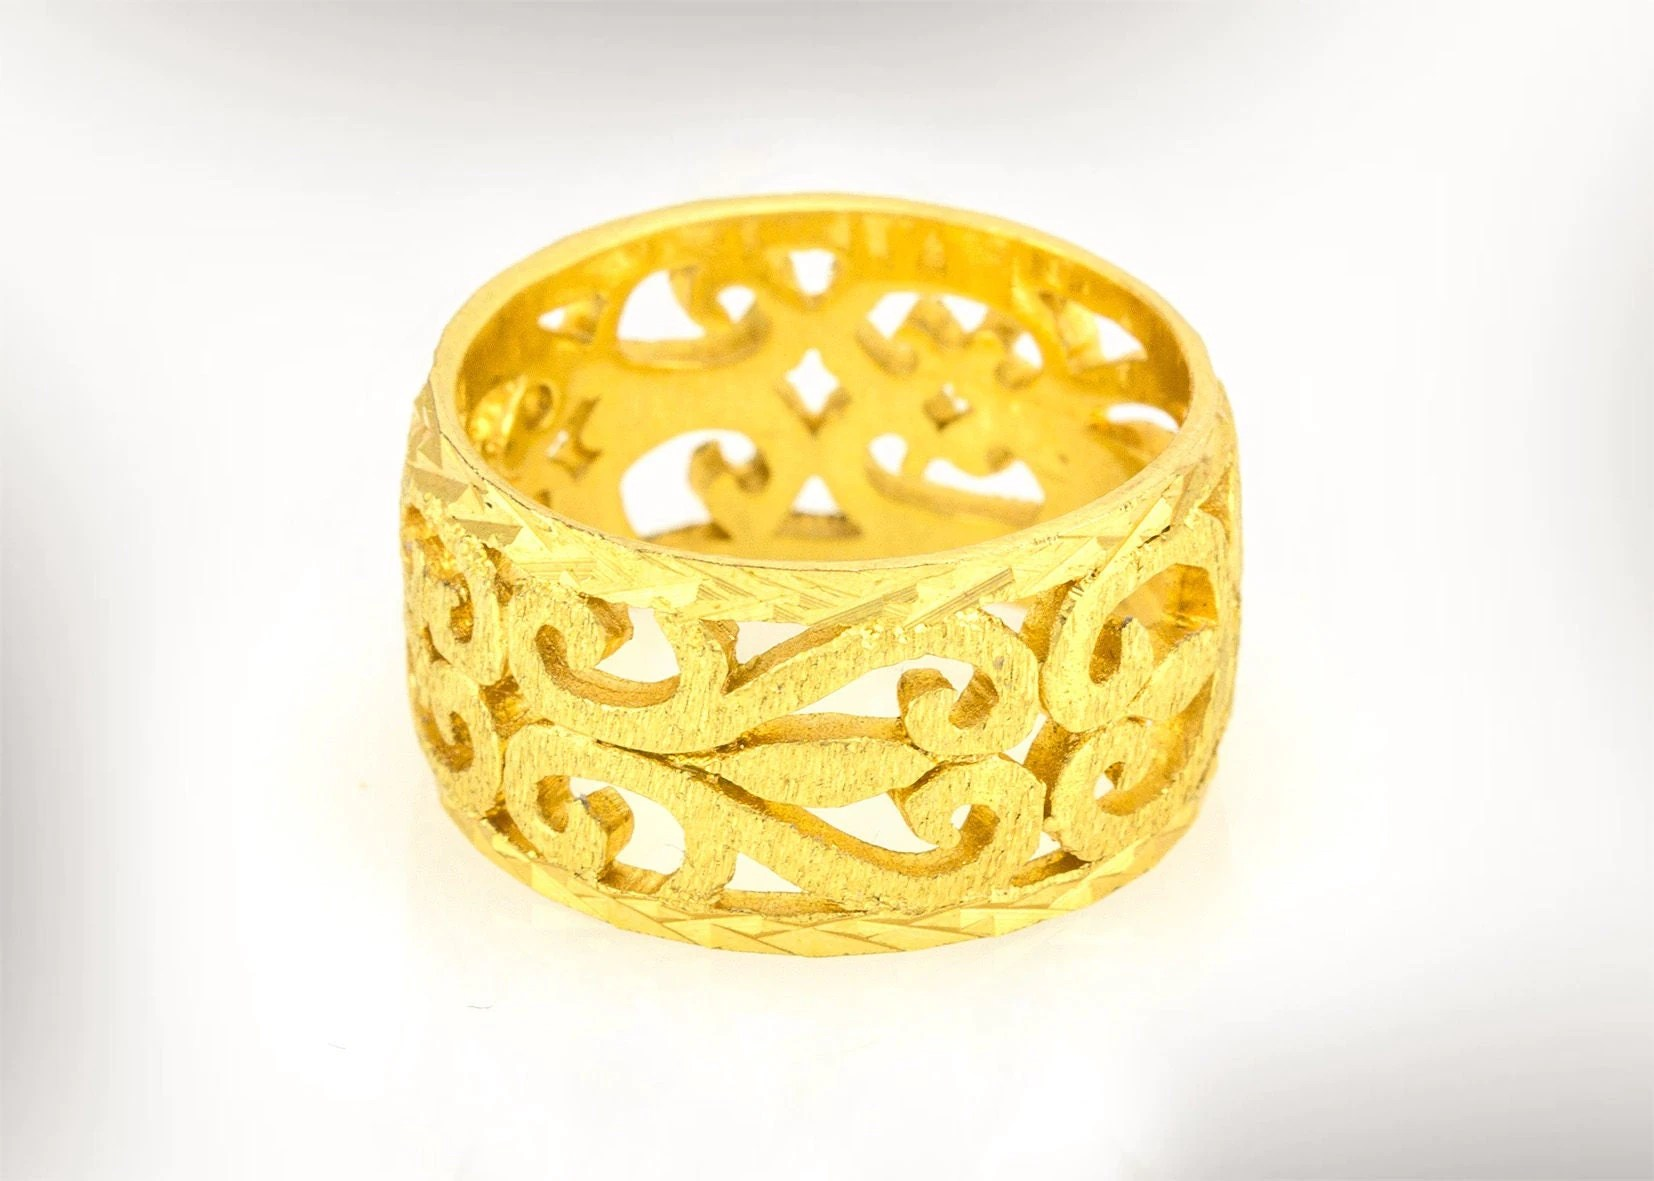 unique wedding band unique wedding ring Unique Wedding Ring Wedding ring Vintage Women Gold Wedding Ring 14k Gold Wedding Ring Bridal Rings Lace Wedding Ring Free Shipping